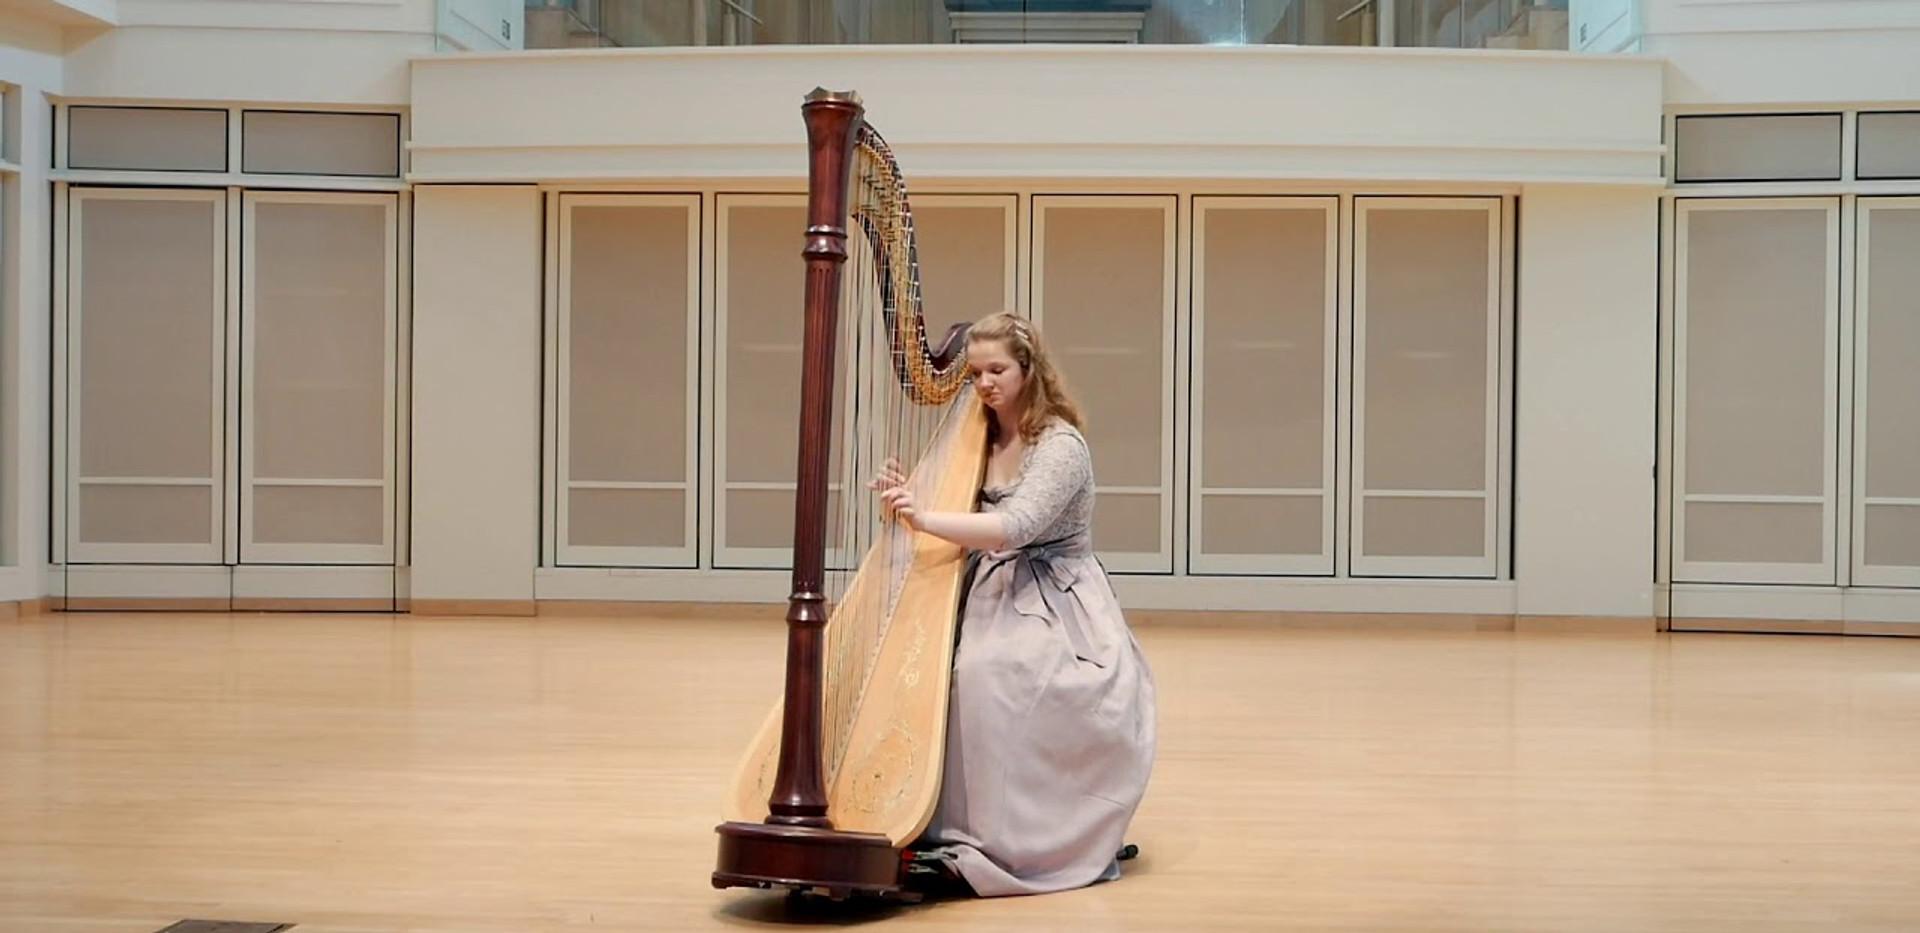 J.S. Bach Suite in E minor BWV 996 II. Allemande